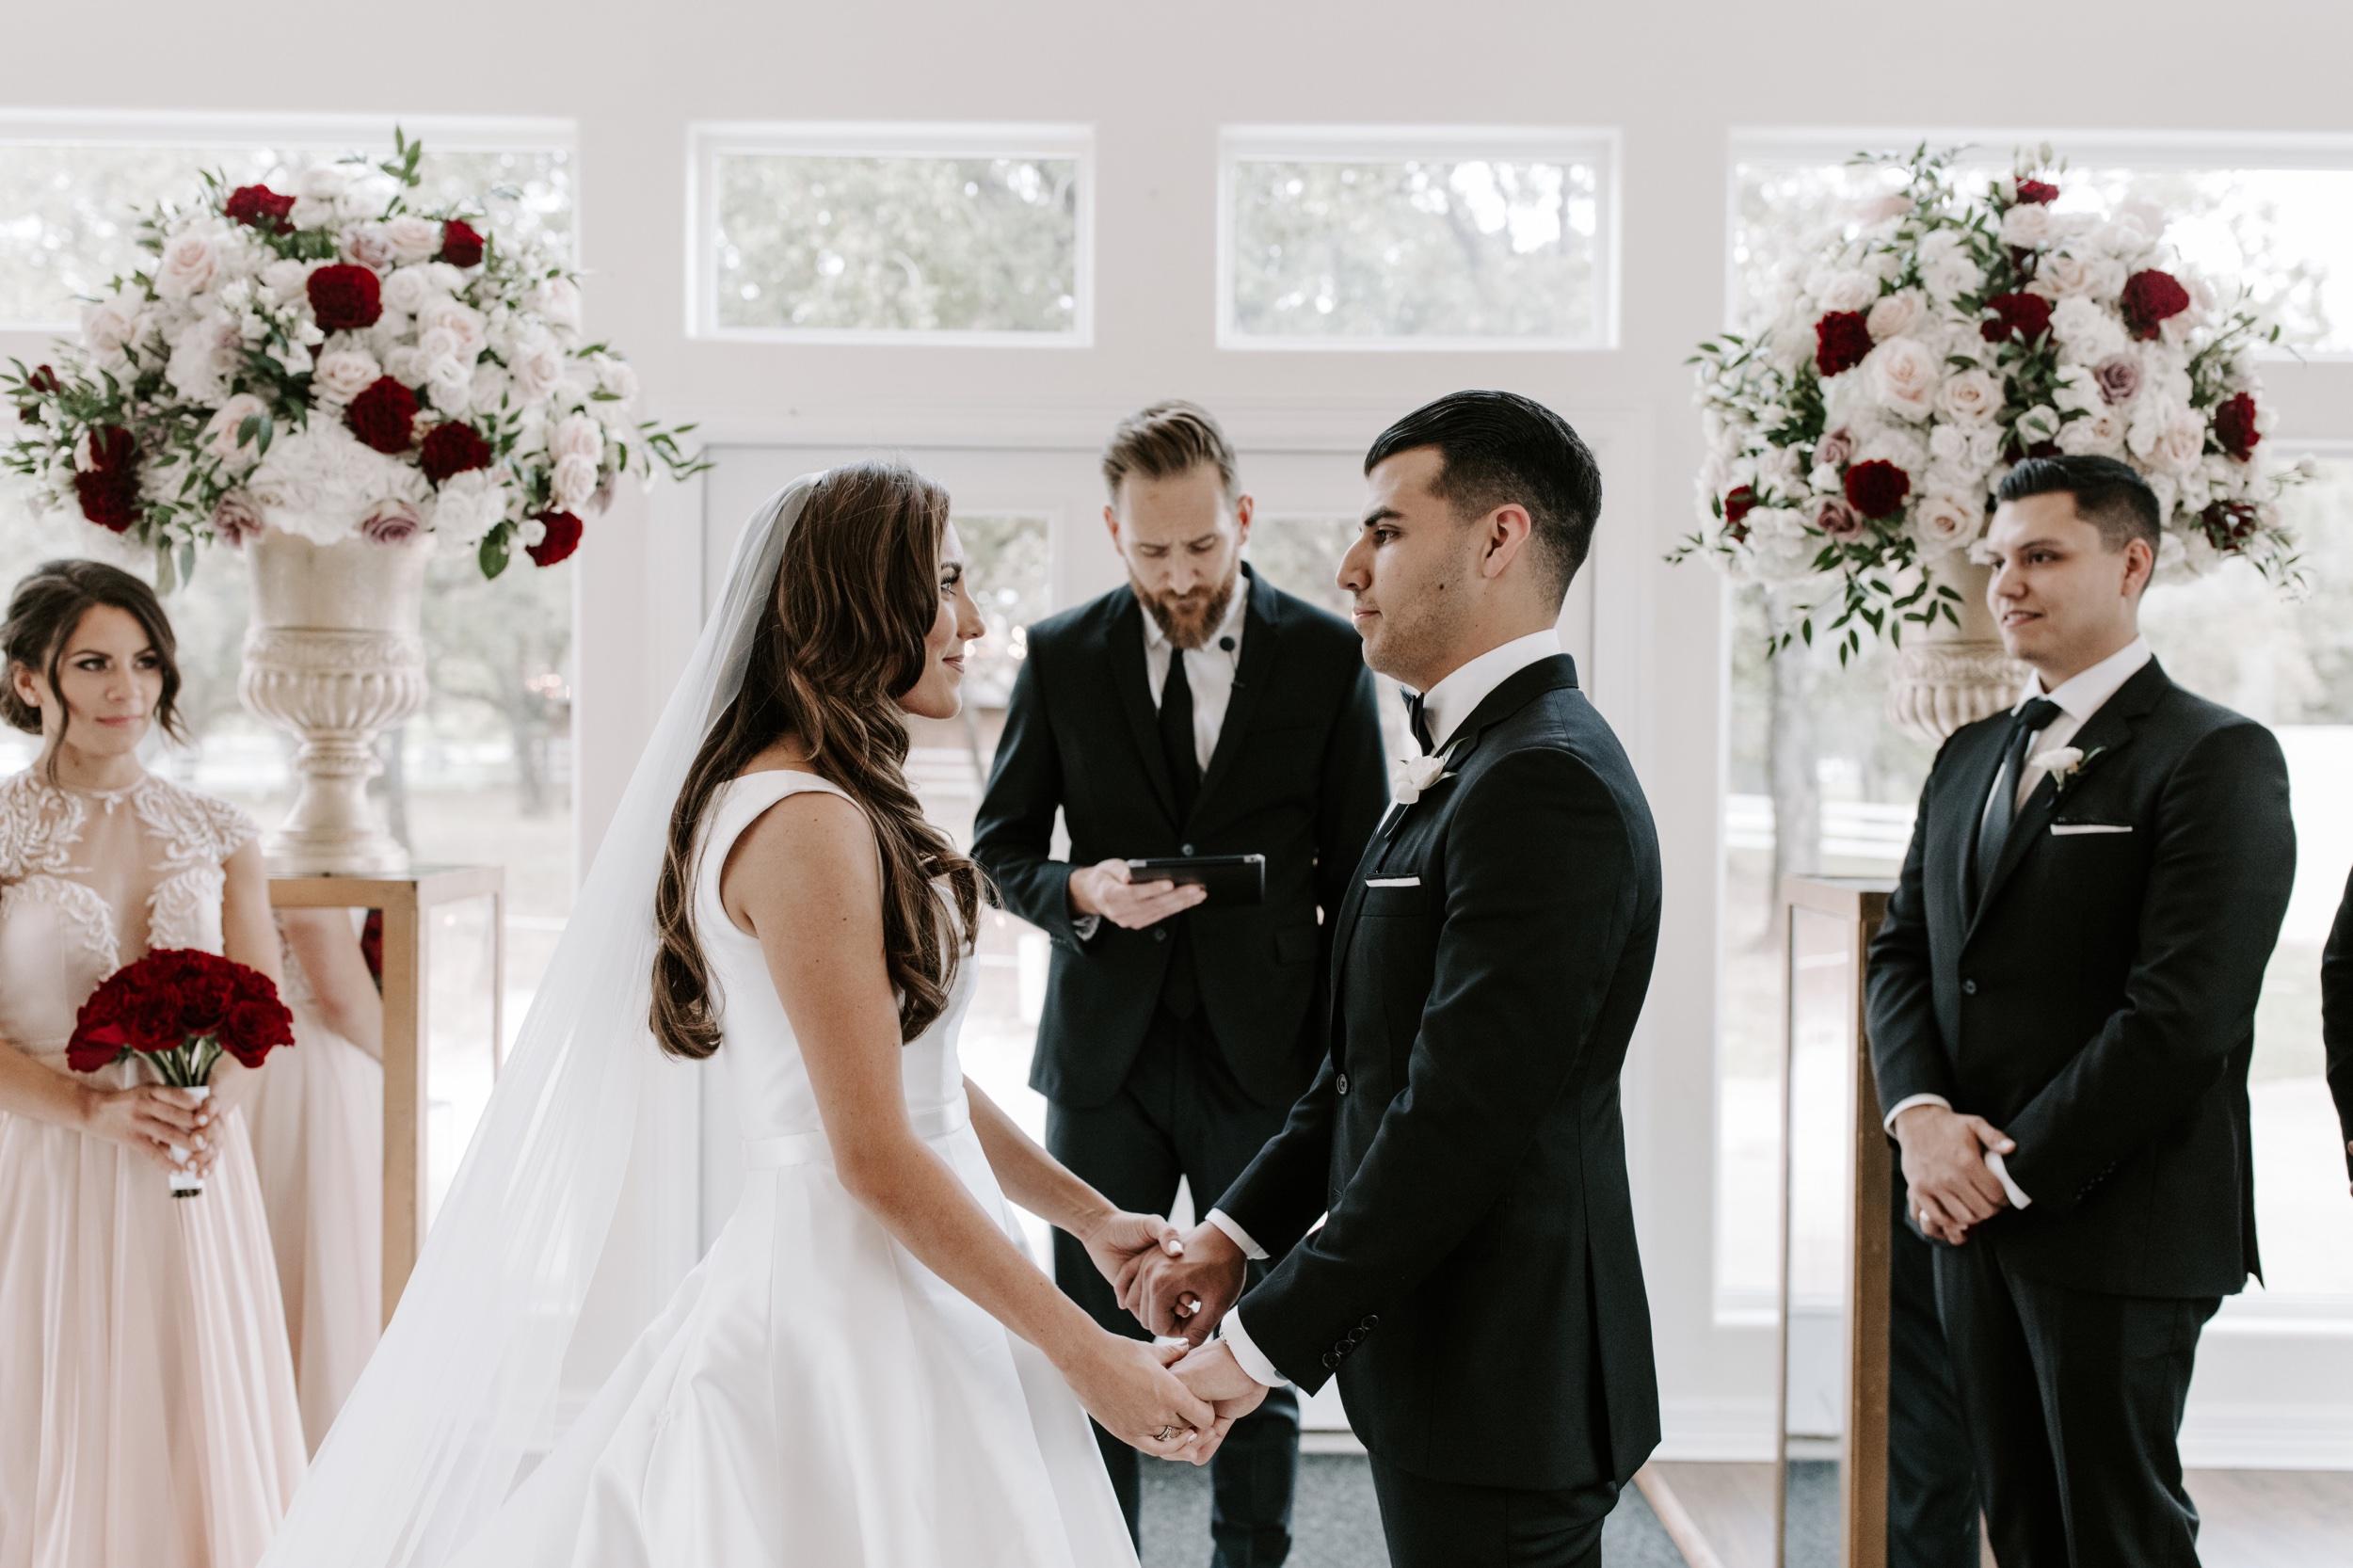 WEDDING - Let's Create Memories